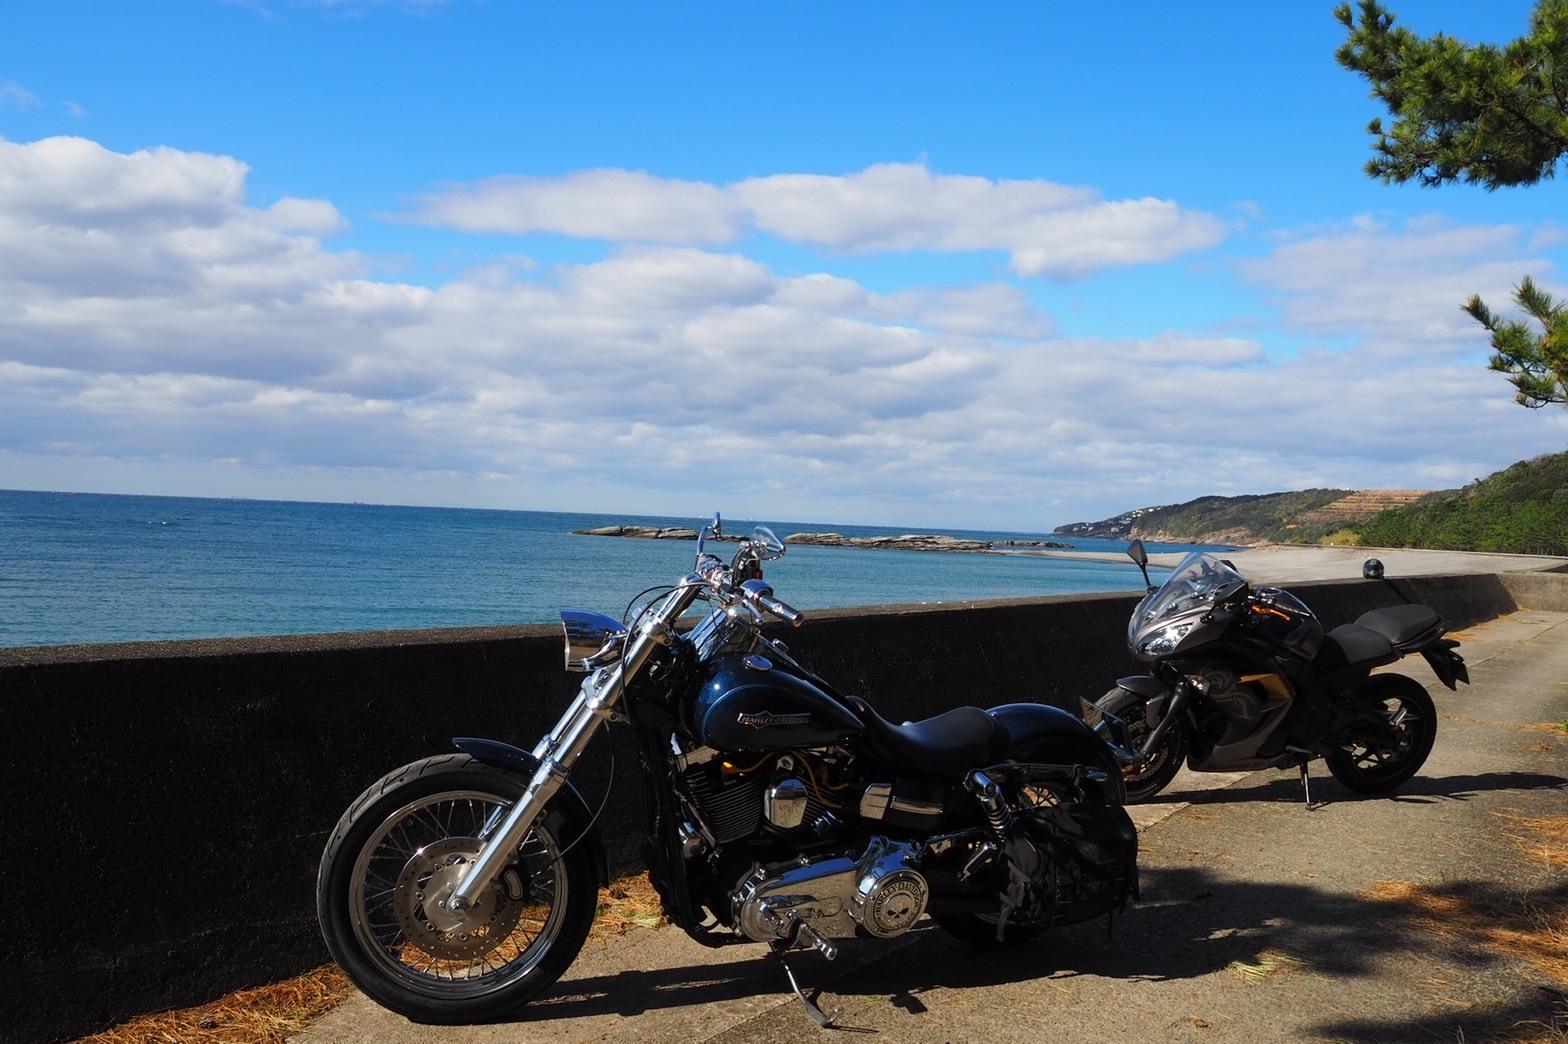 harleydavidson-motorcycle-touring-blog-wakayama-nankishirahama-oma-beach-ninja.jpg